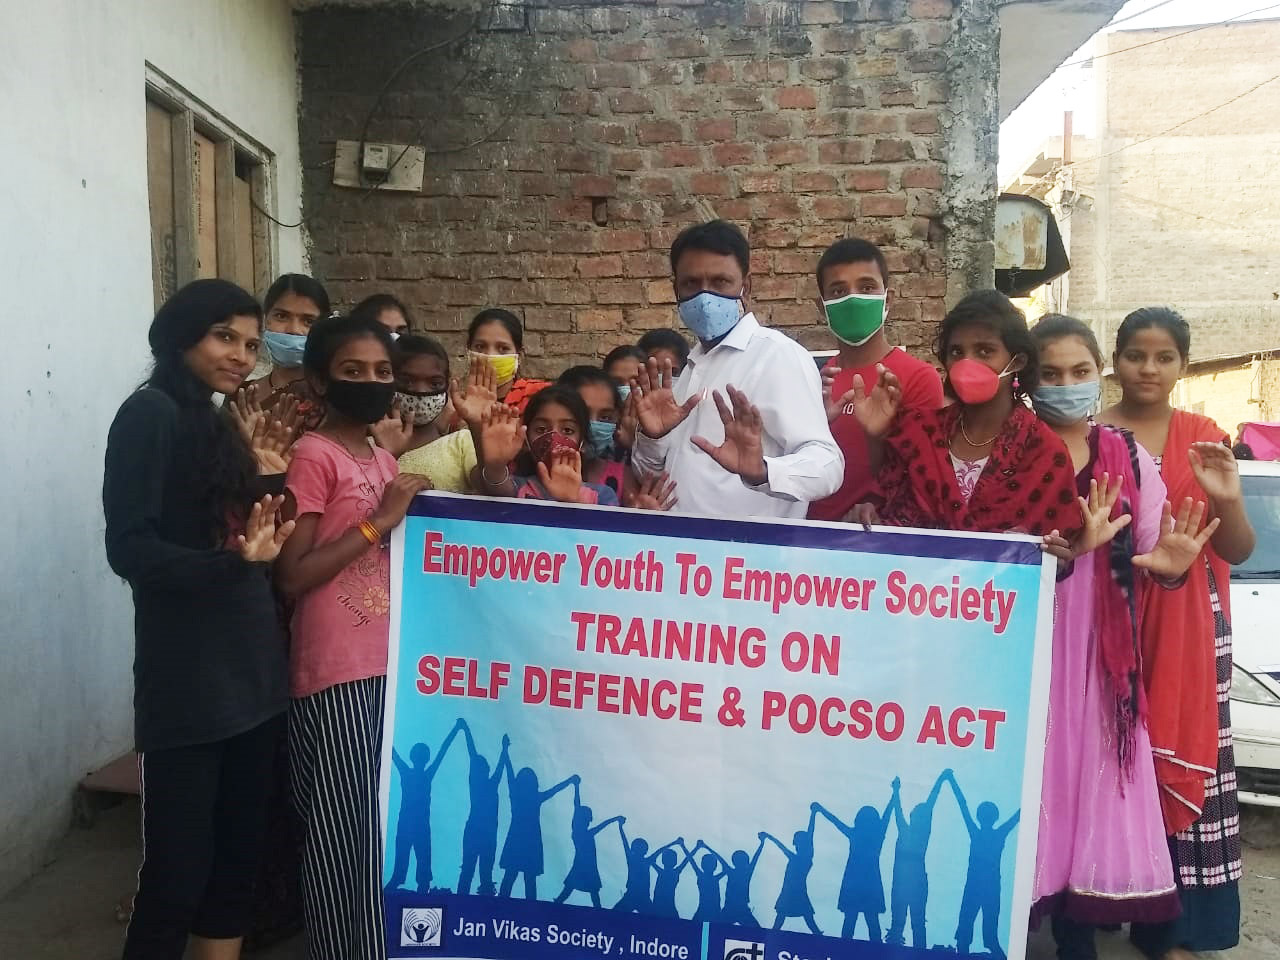 Training on Self Defence